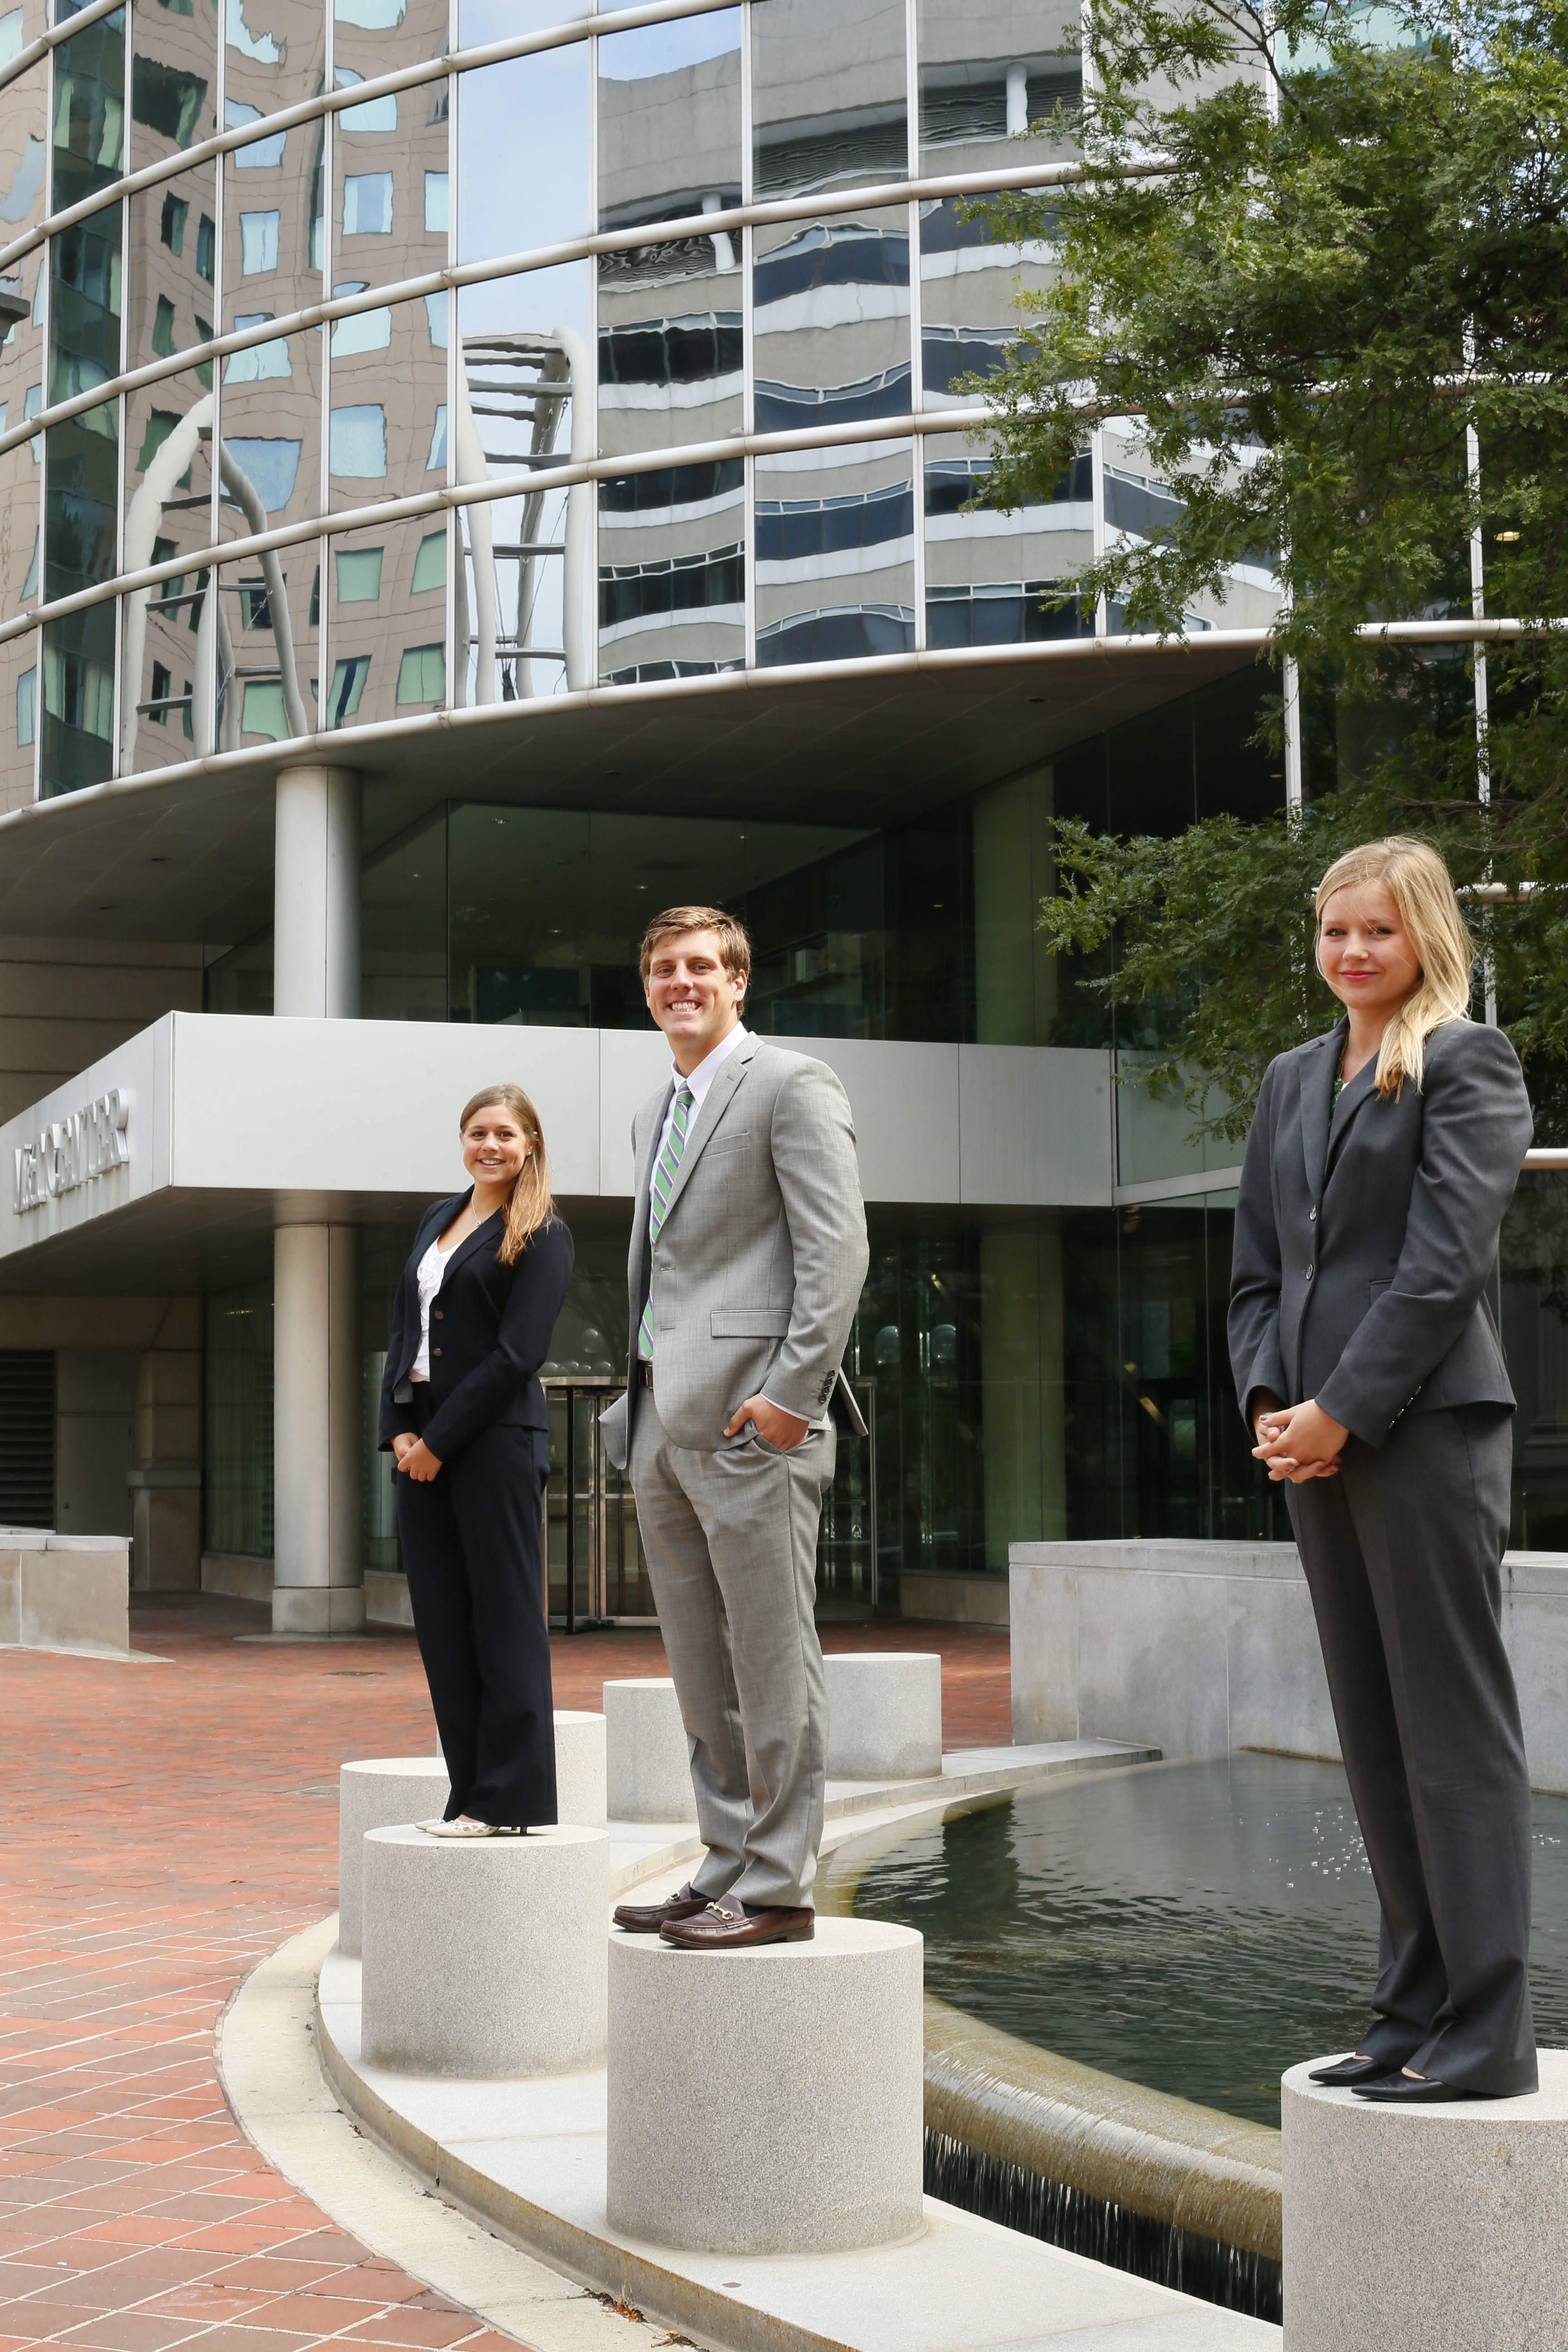 Laura Savattieri, left, Taylor Hogenkamp, center, and Christianna Denelsbeck participate in M&T Bank's management development program.